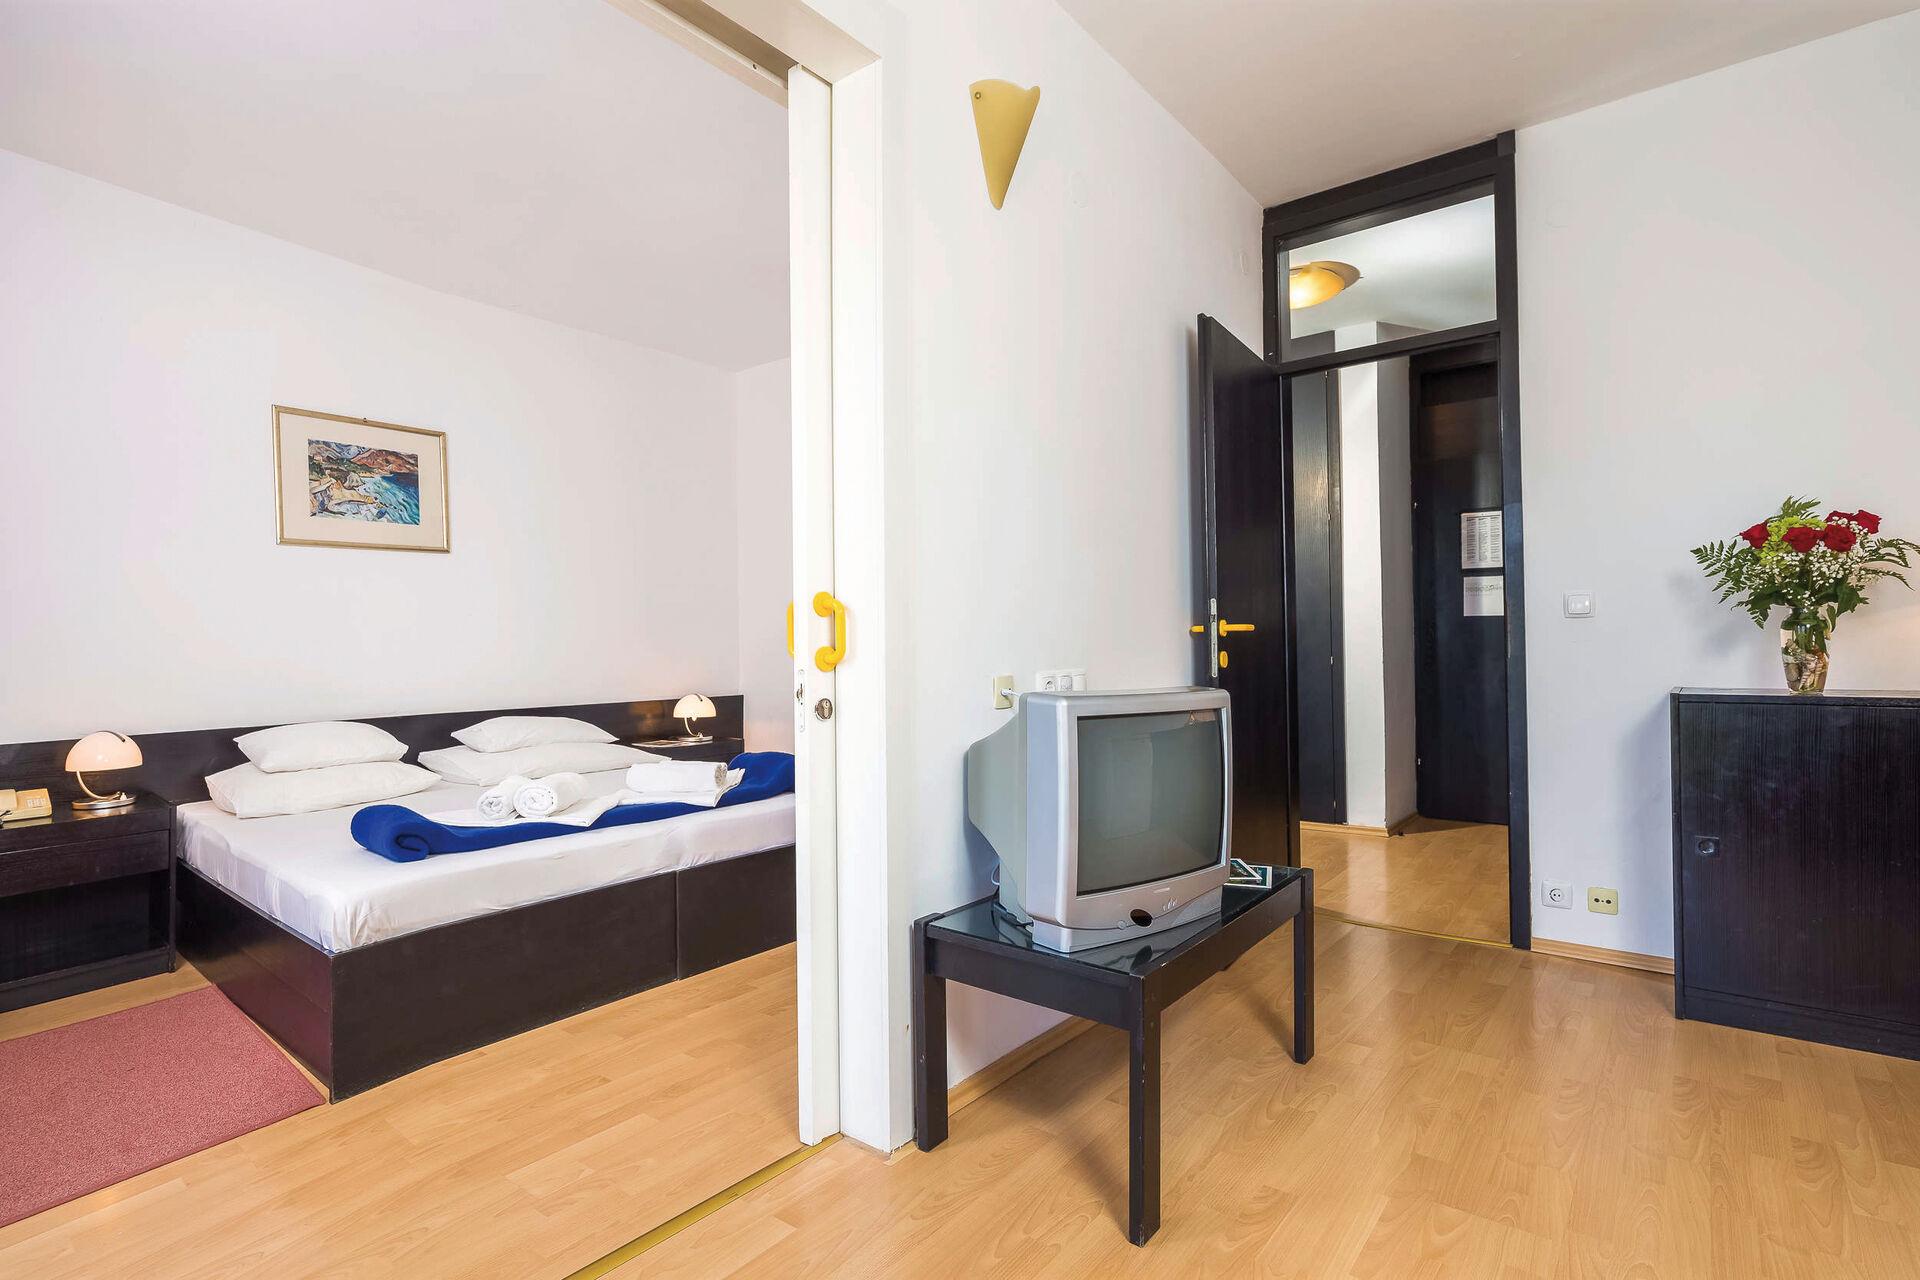 Croatie - Ile de Hvar - Hotel Hvar 3*